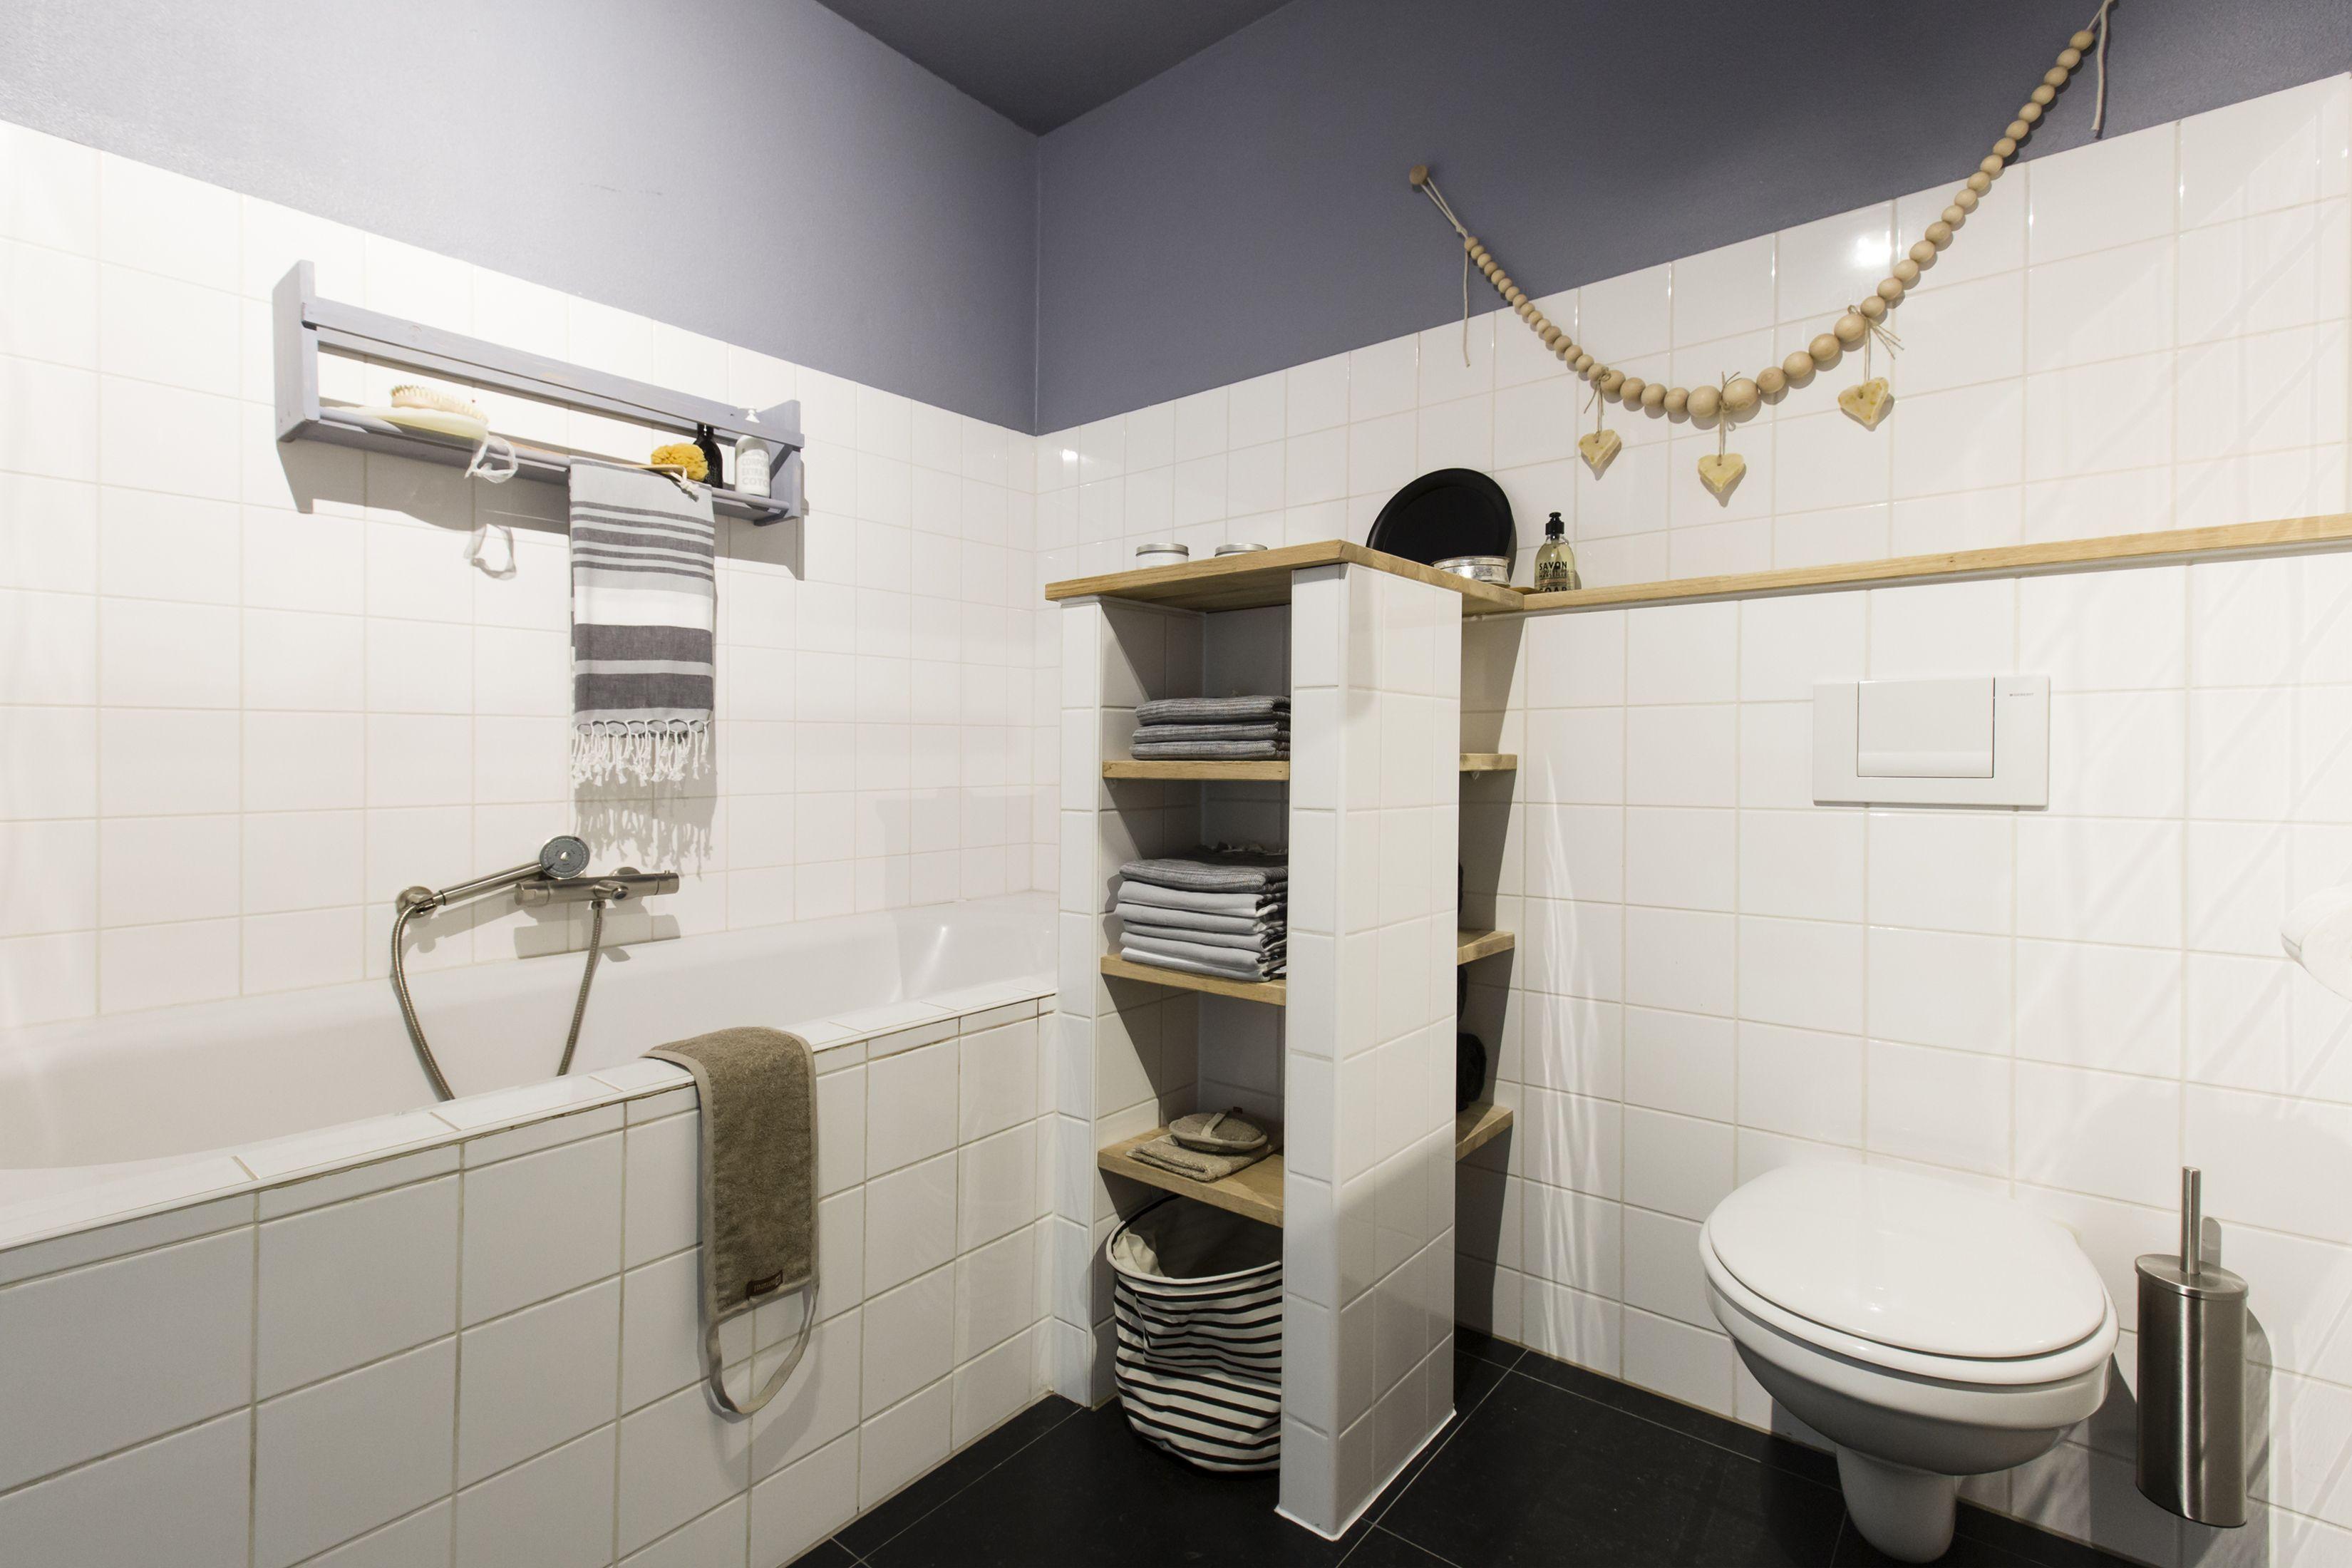 Gekleurd plafond badkamer | Home | Pinterest